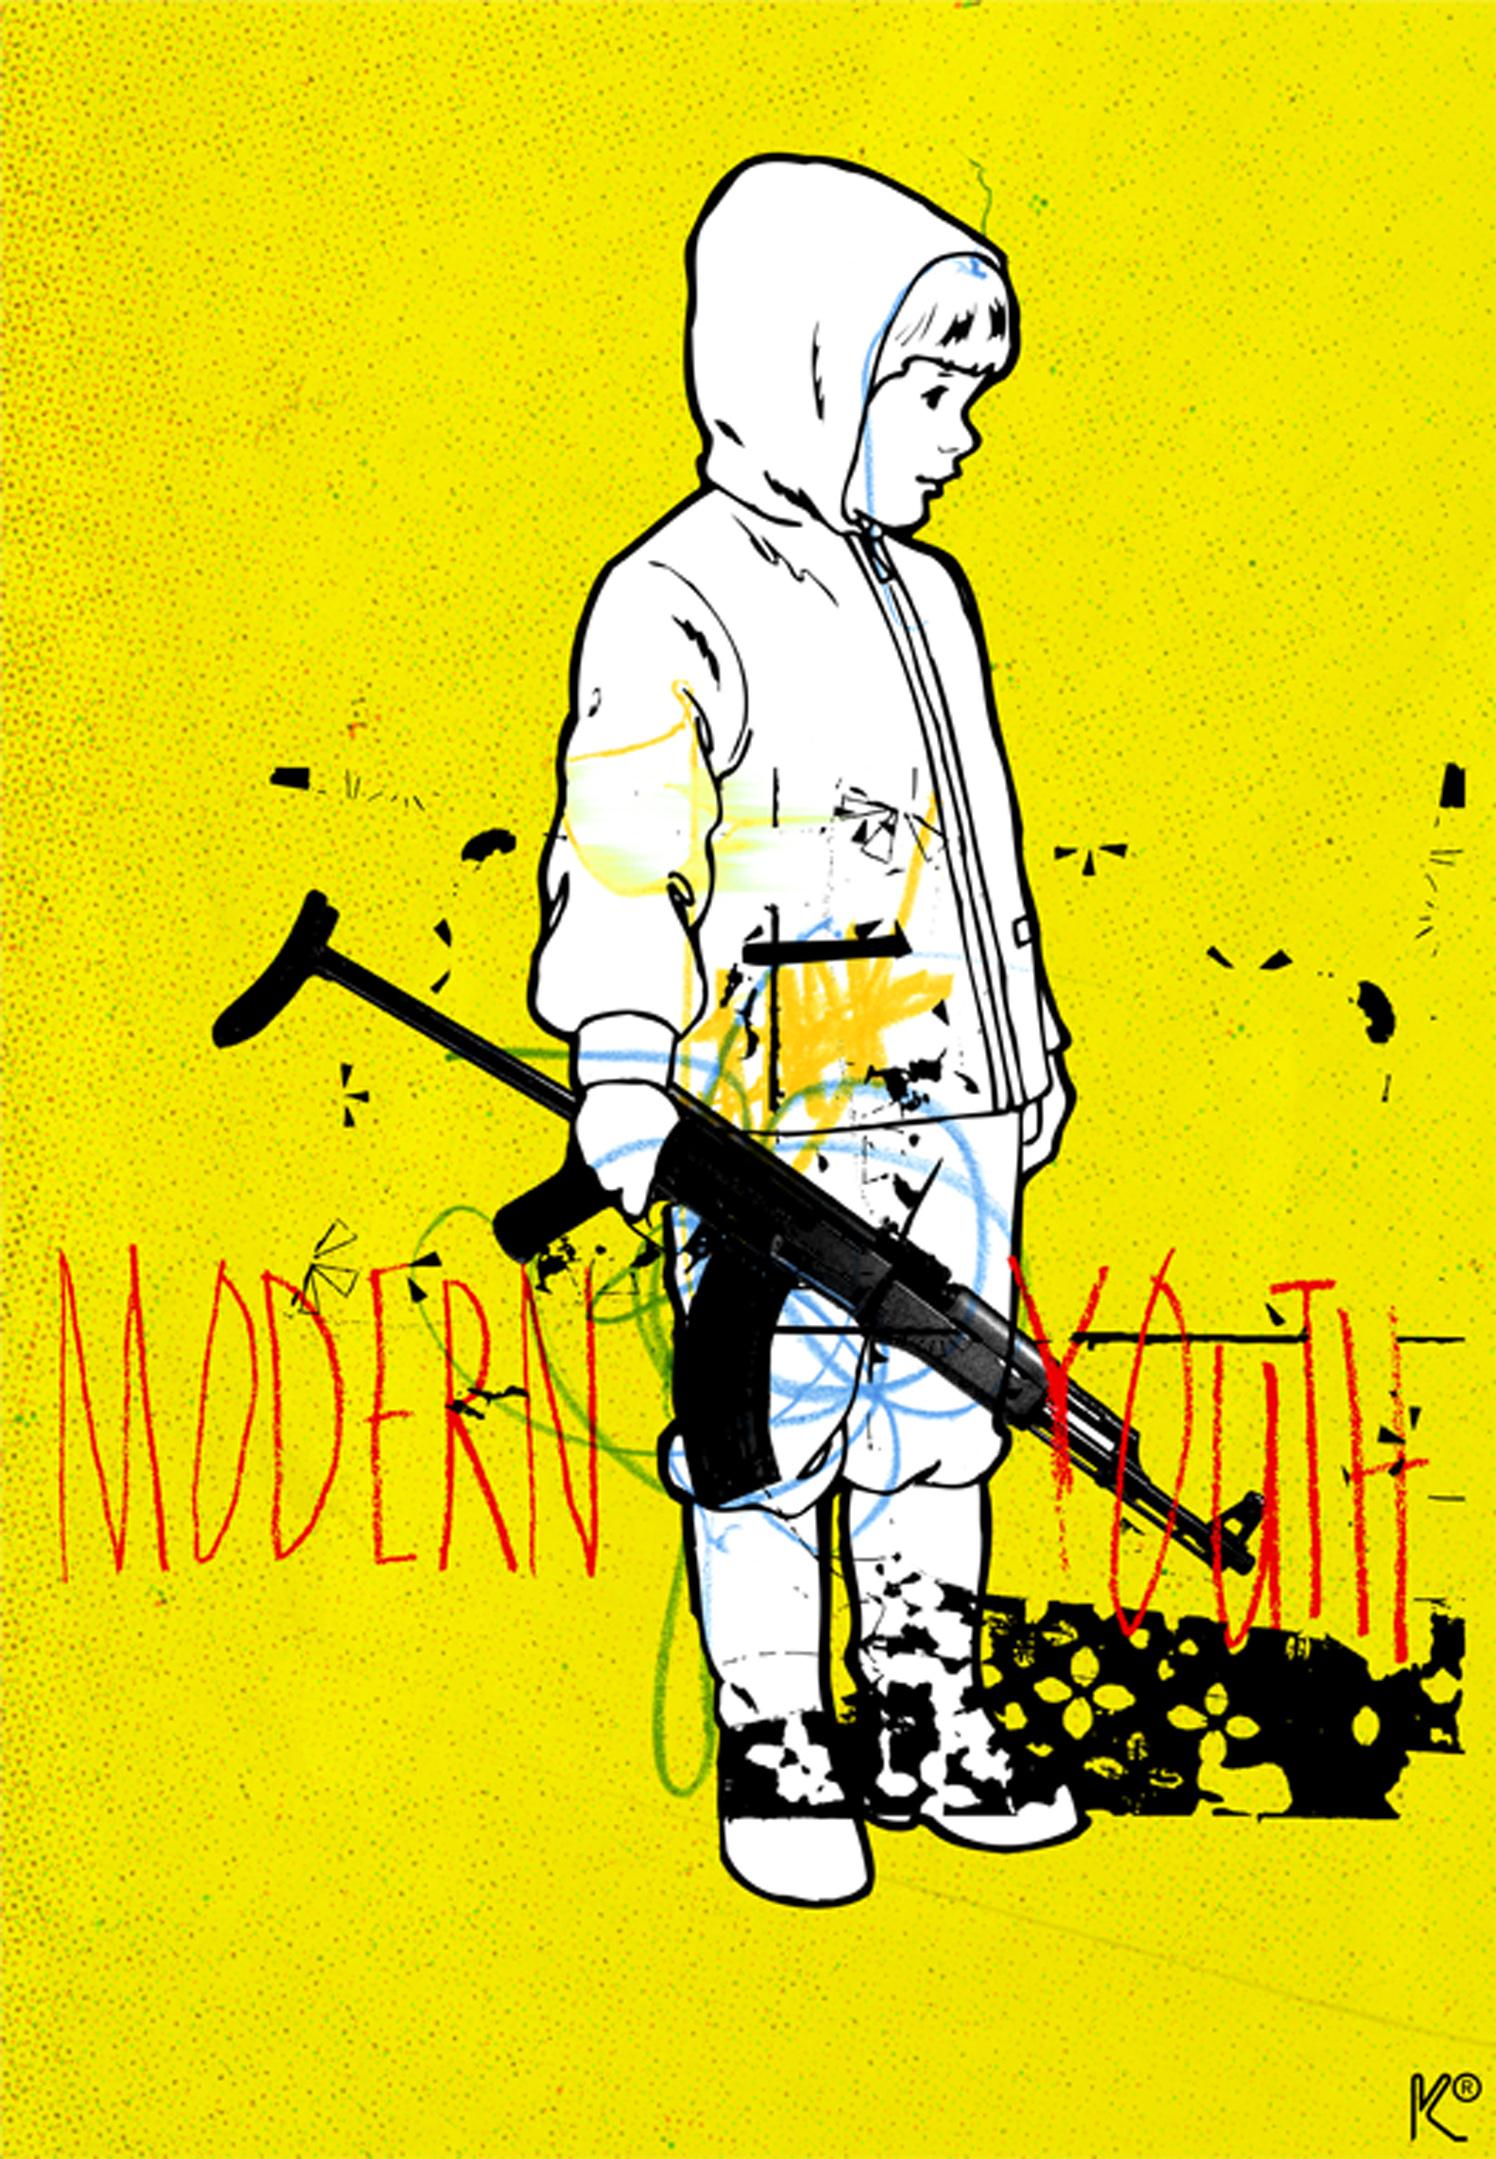 Modern Youth